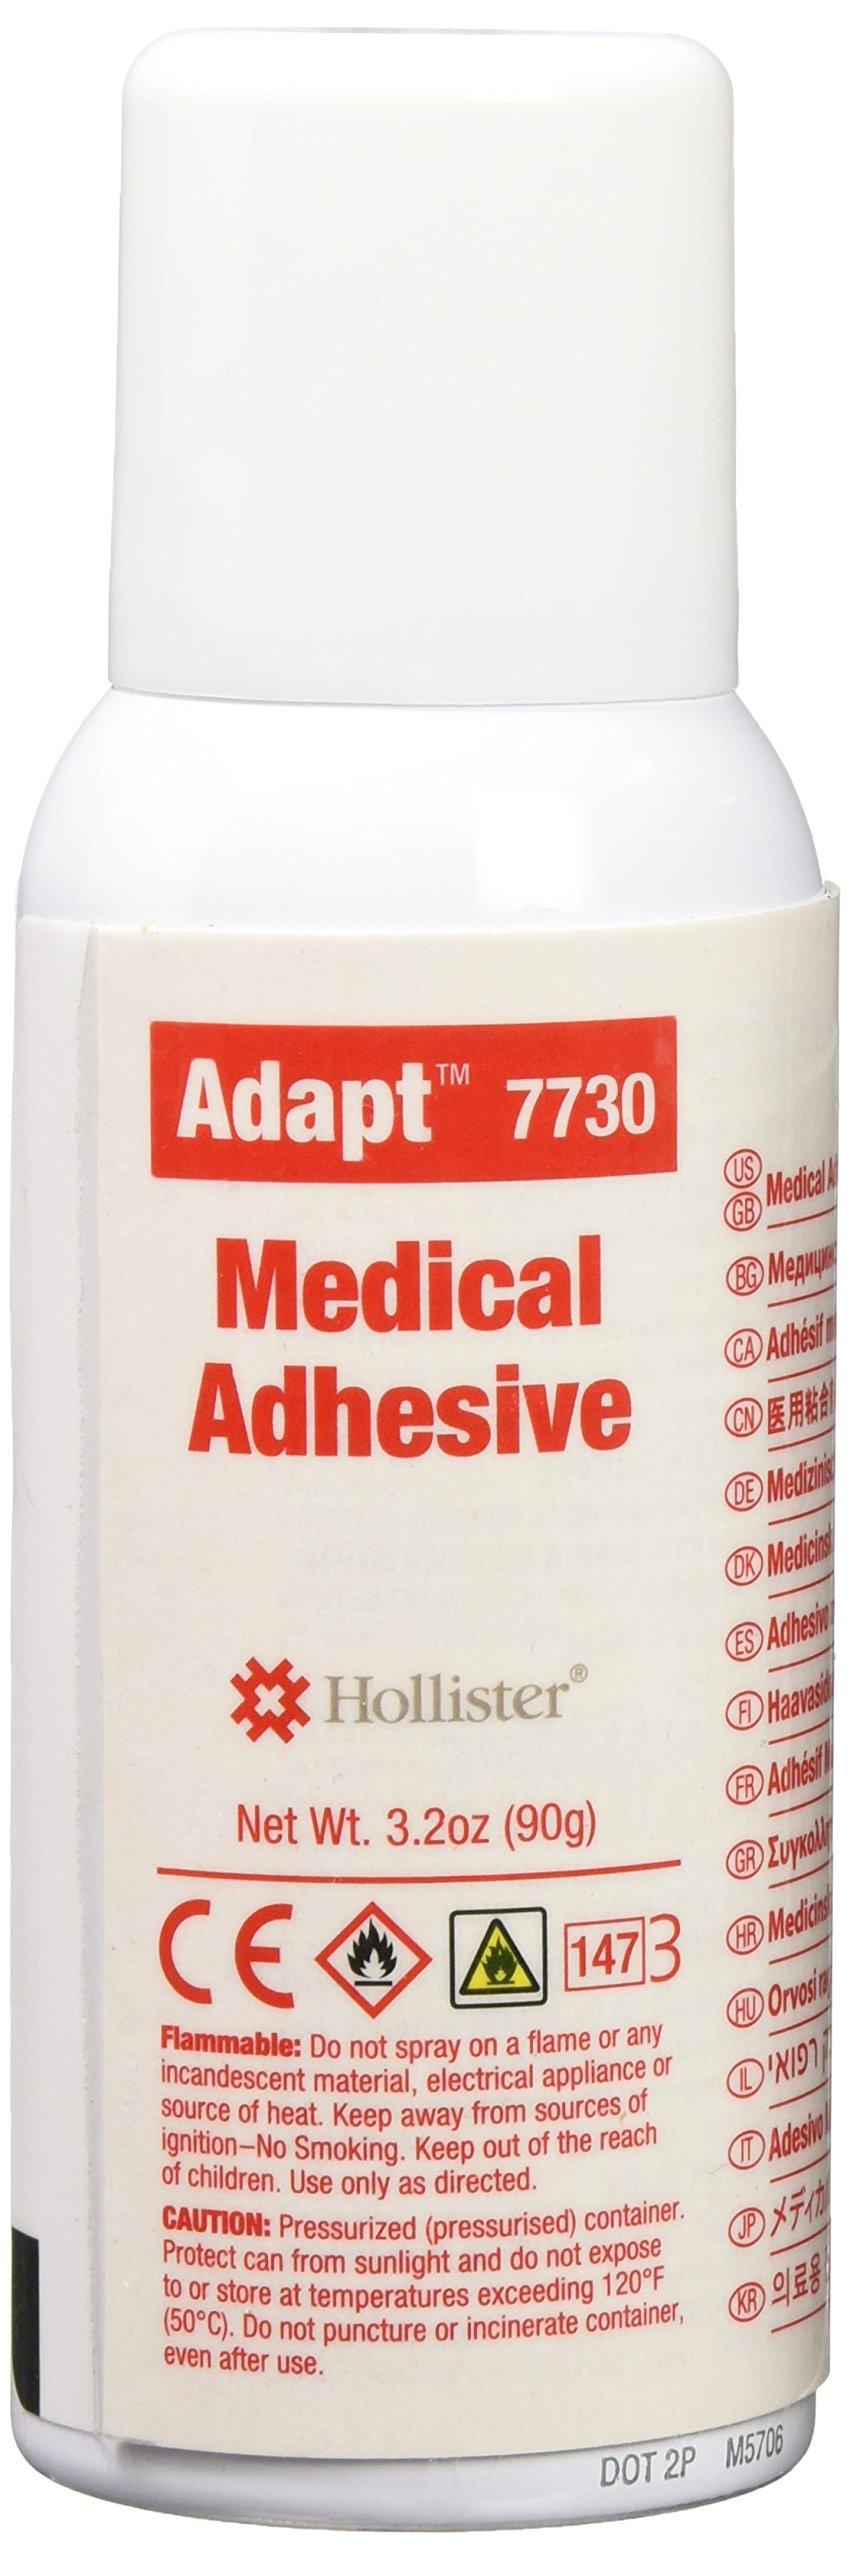 Hollister Medical Adhesive, HOL7730, 3.8 Ounce